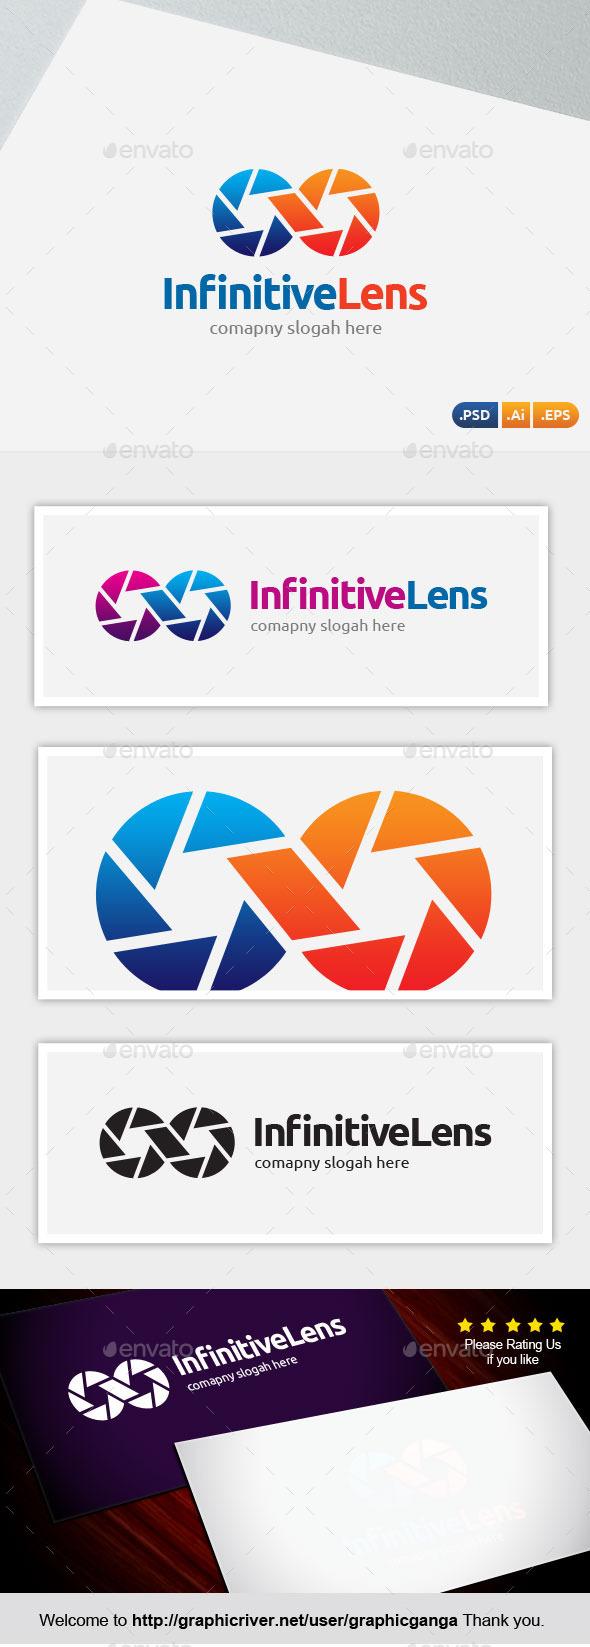 Infinitive Lens